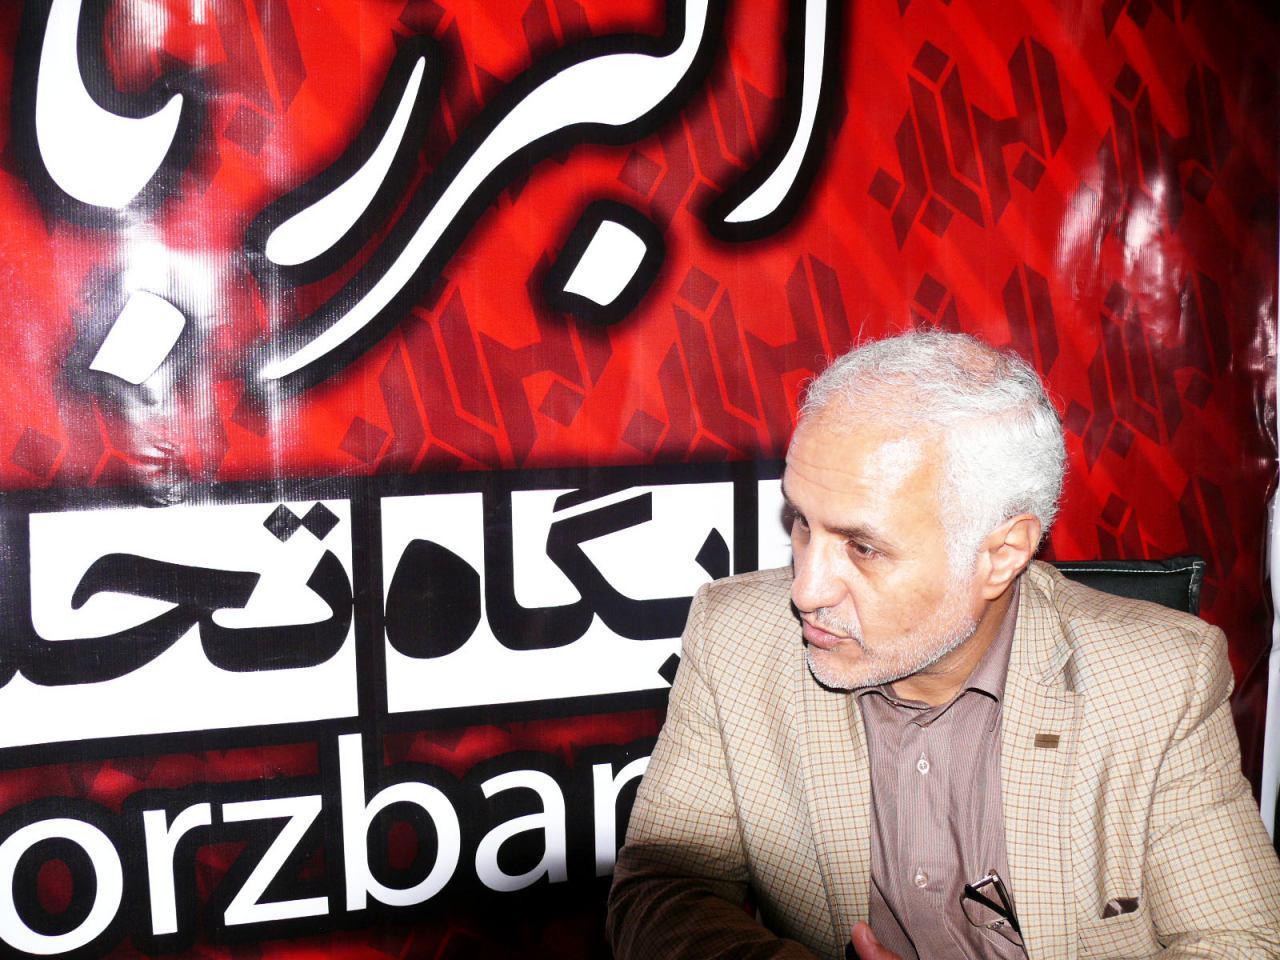 photo alborzban حضور استاد حسن عباسی در غرفه البرزبان در سومین نمایشگاه رسانههای دیجیتال انقلاب اسلامی